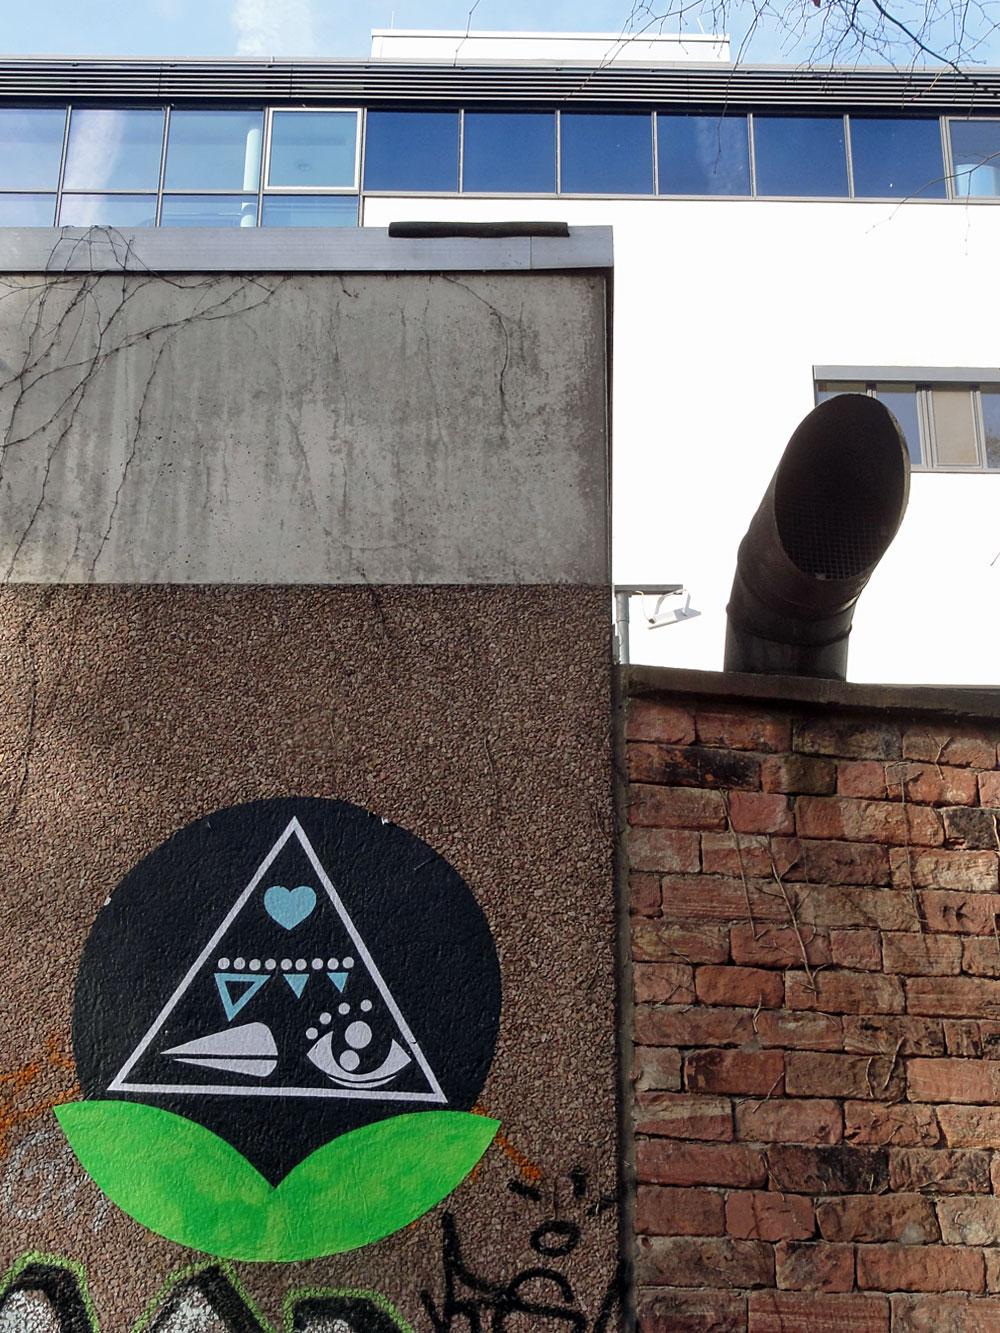 streetart-frankfurt-schnabel-kreis-pyramide